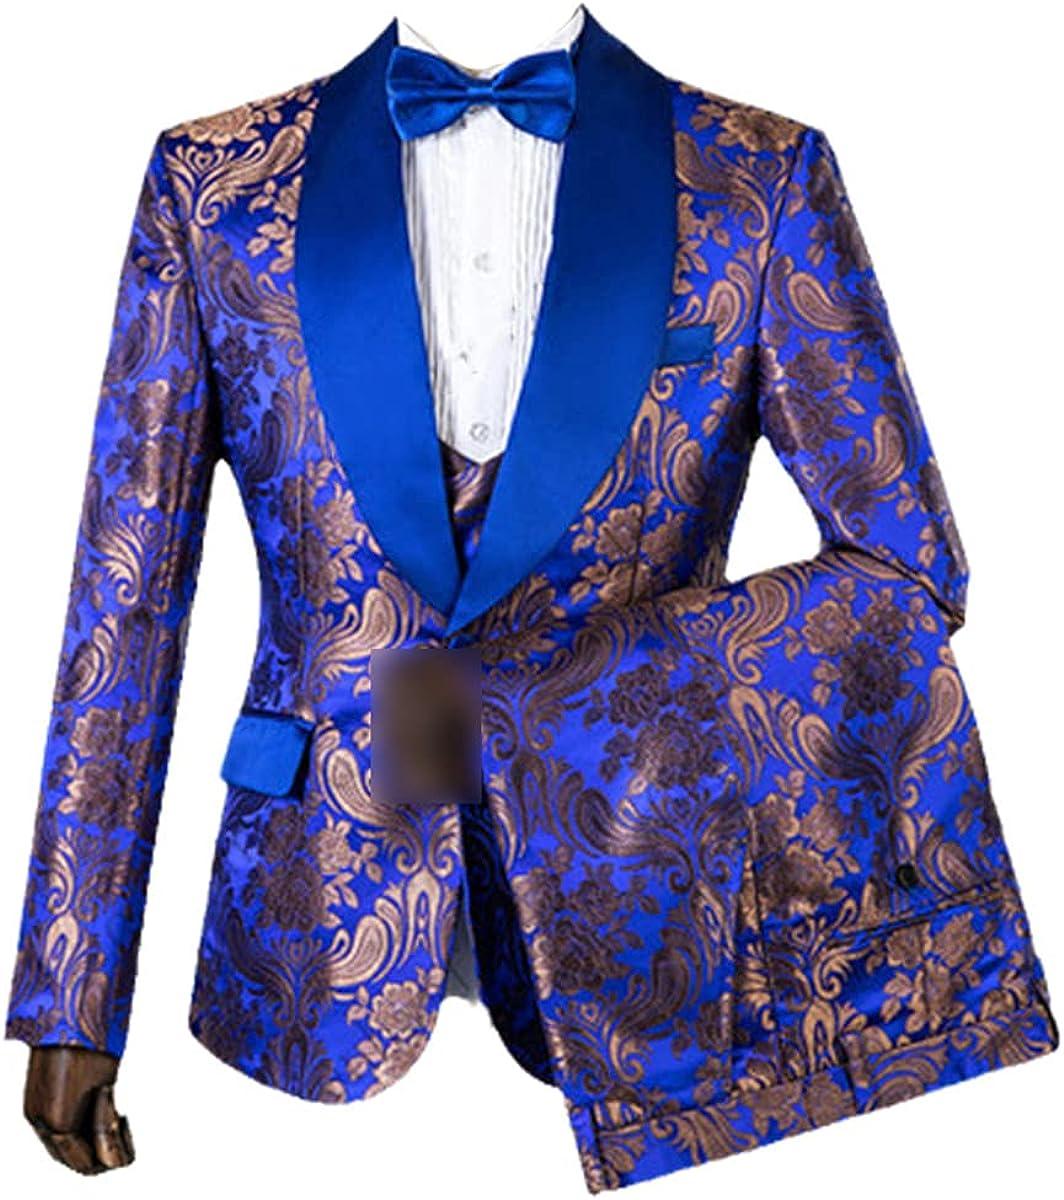 Royal Blue Slim Custom Men's Suit Wedding Suit Groom Tuxedo Three-Piece Best Man Suit